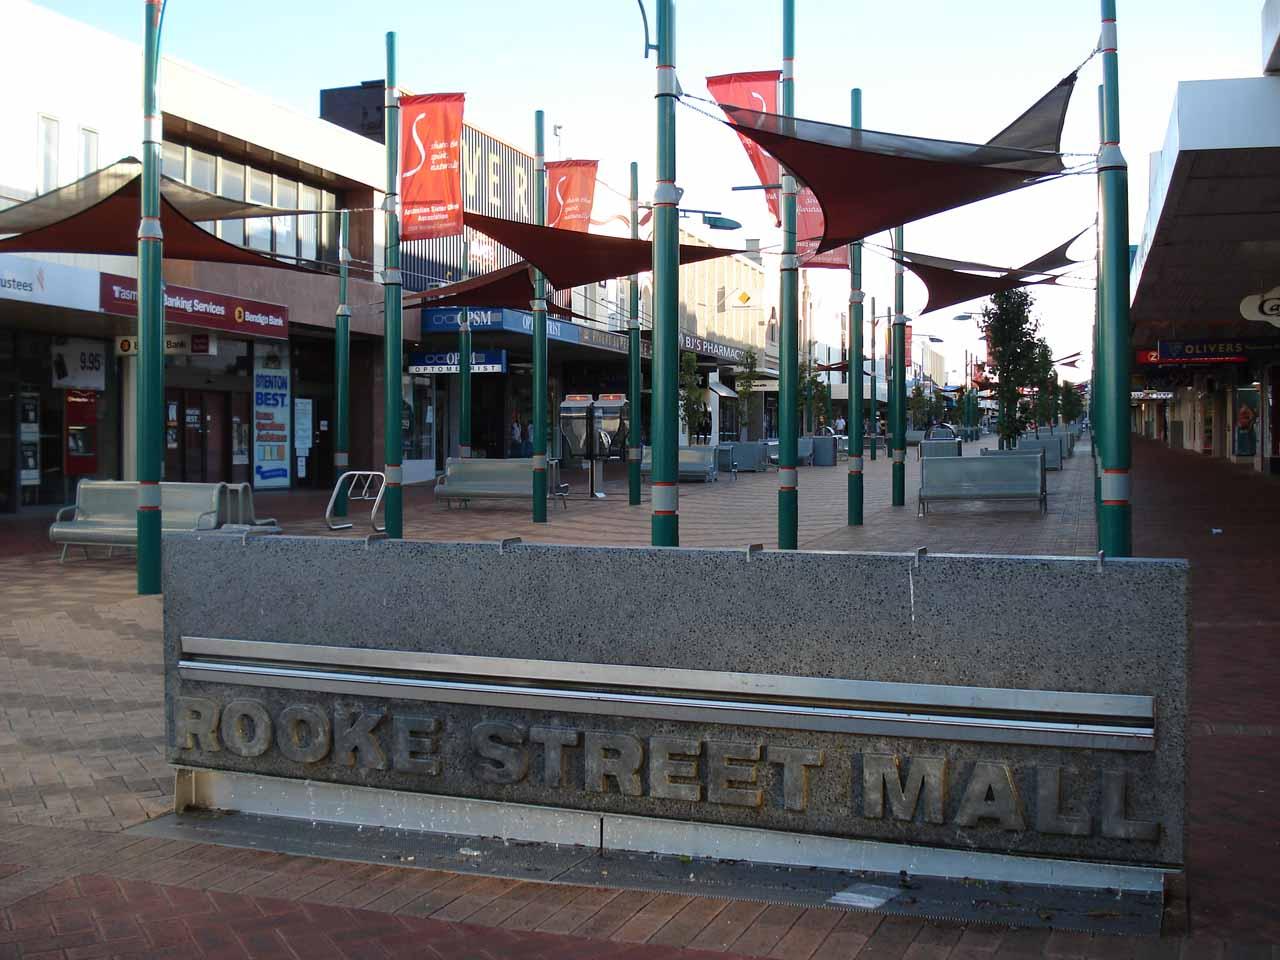 Sign for the Rooke Street Mall in Devonport